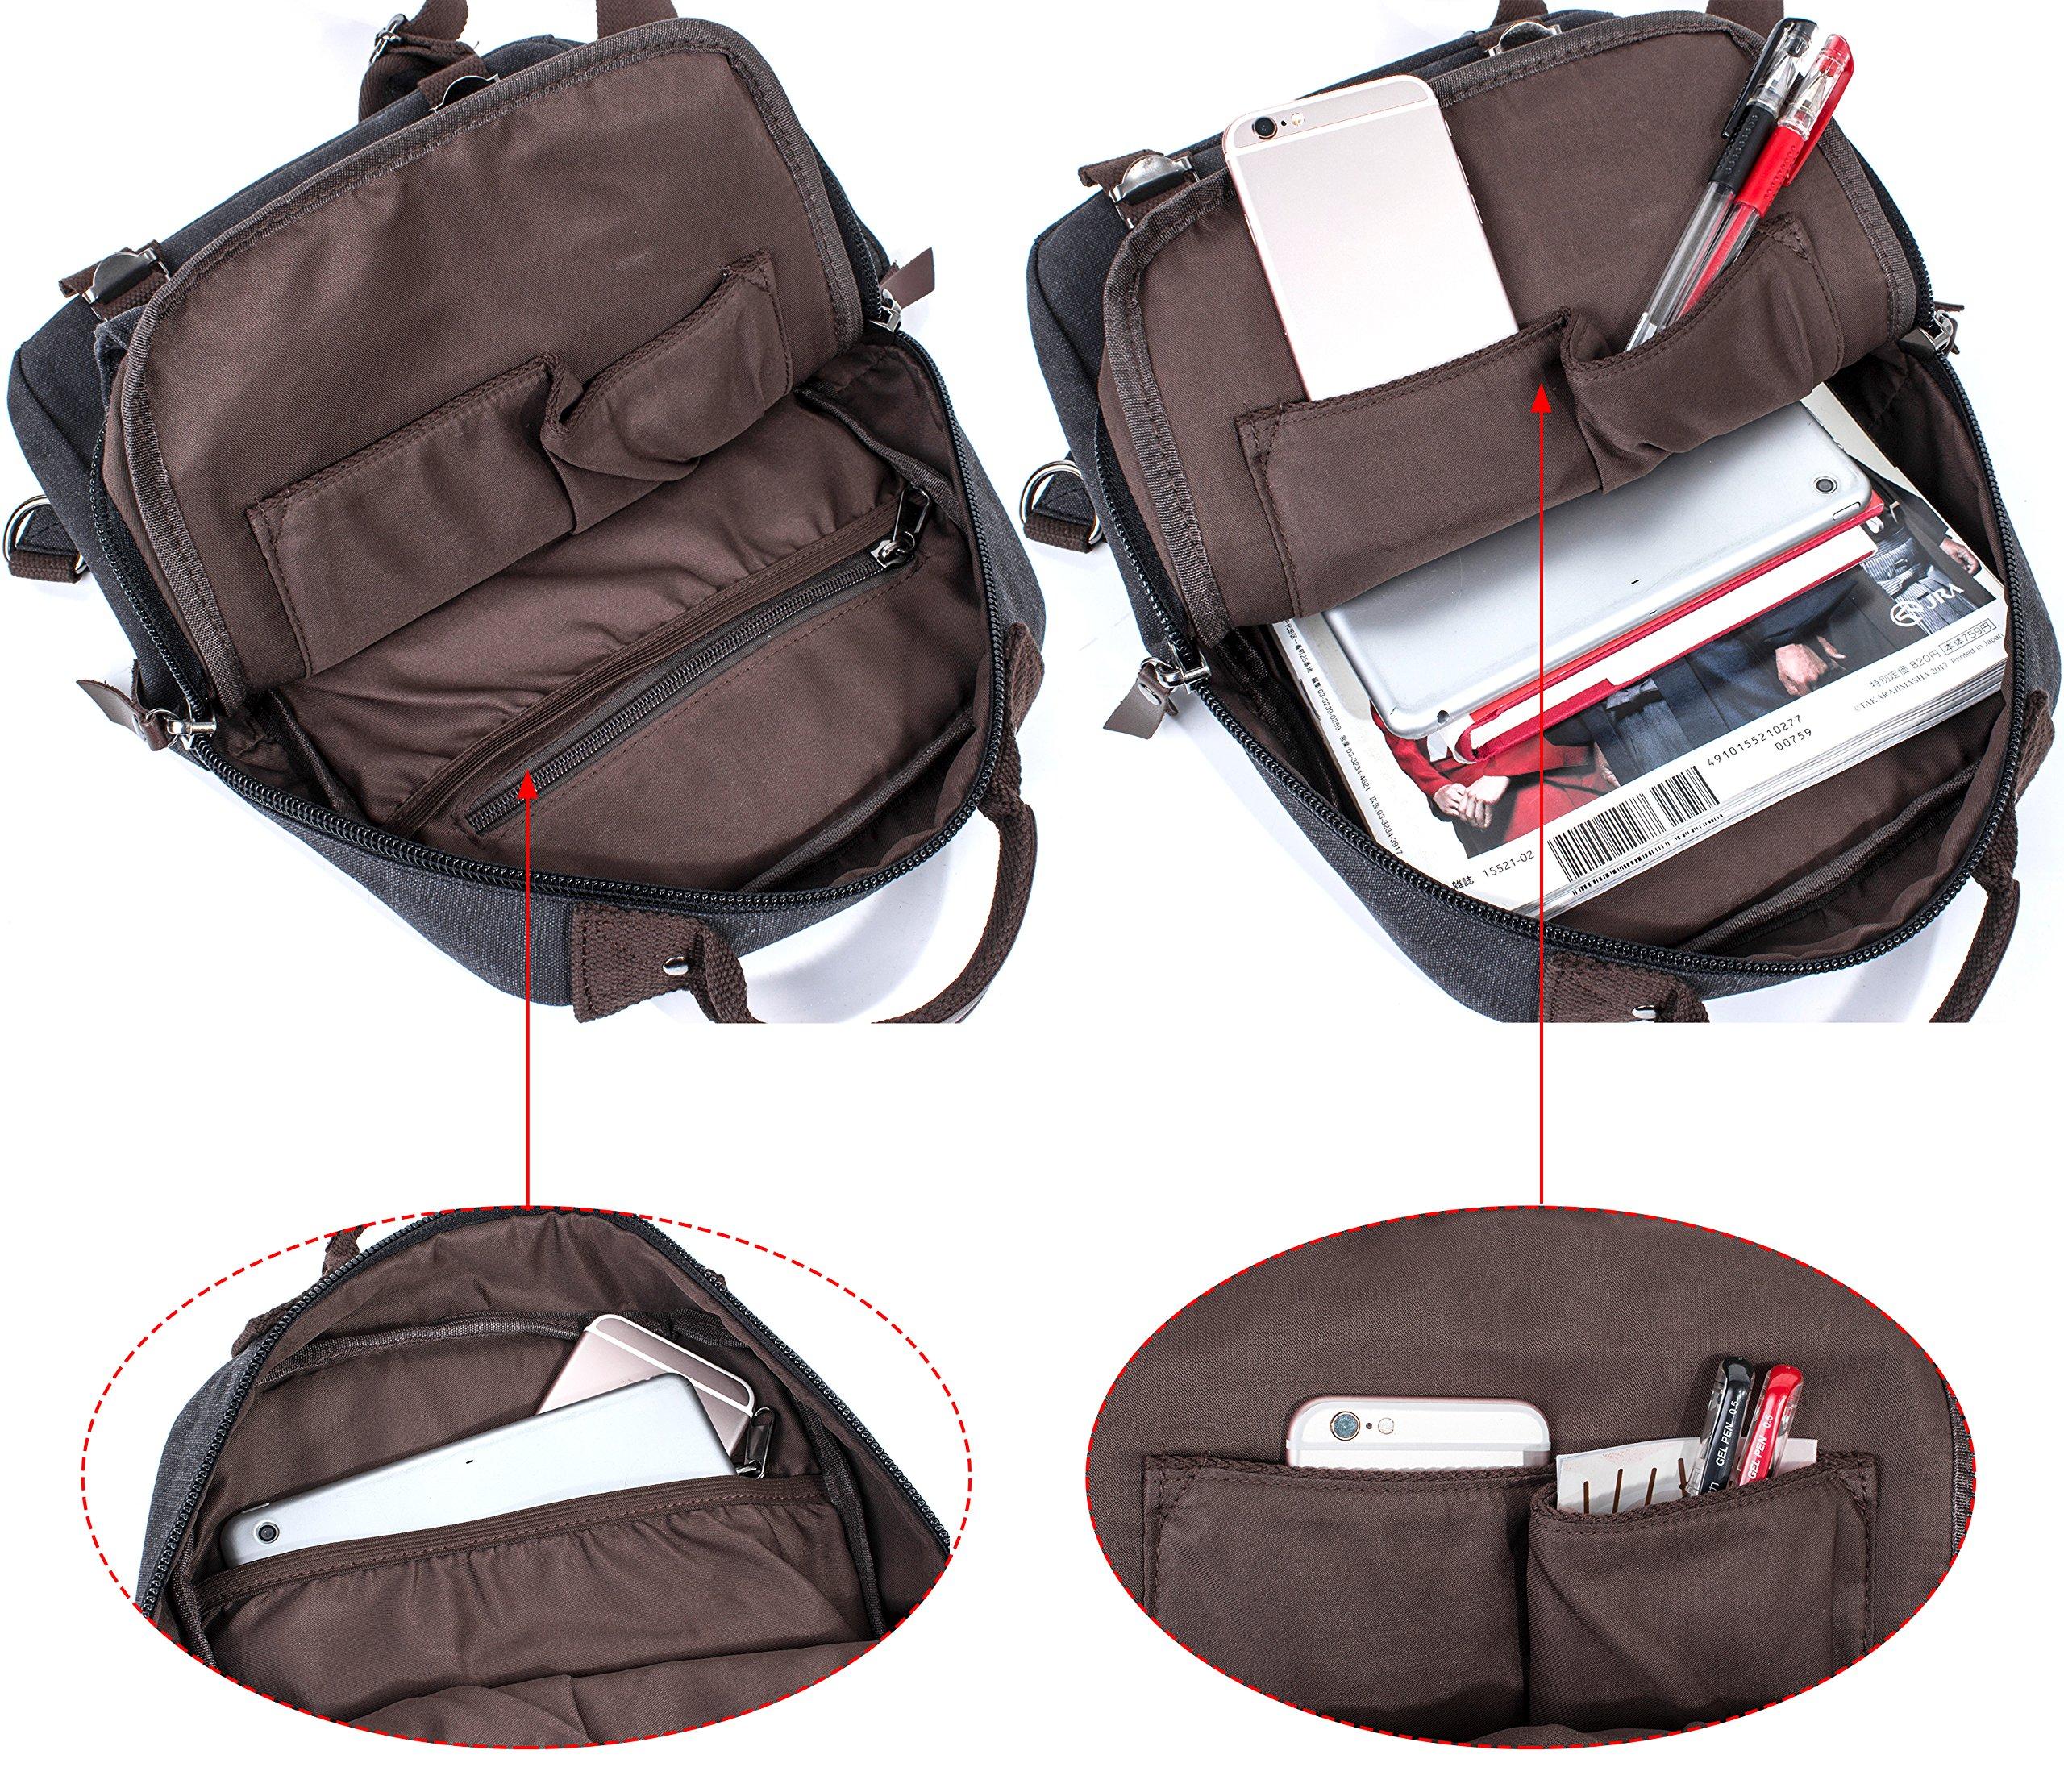 f38457e534 Leaper Canvas Message Sling Bag Outdoor Cross Body Bag Messenger Shoulder  Bag (Medium